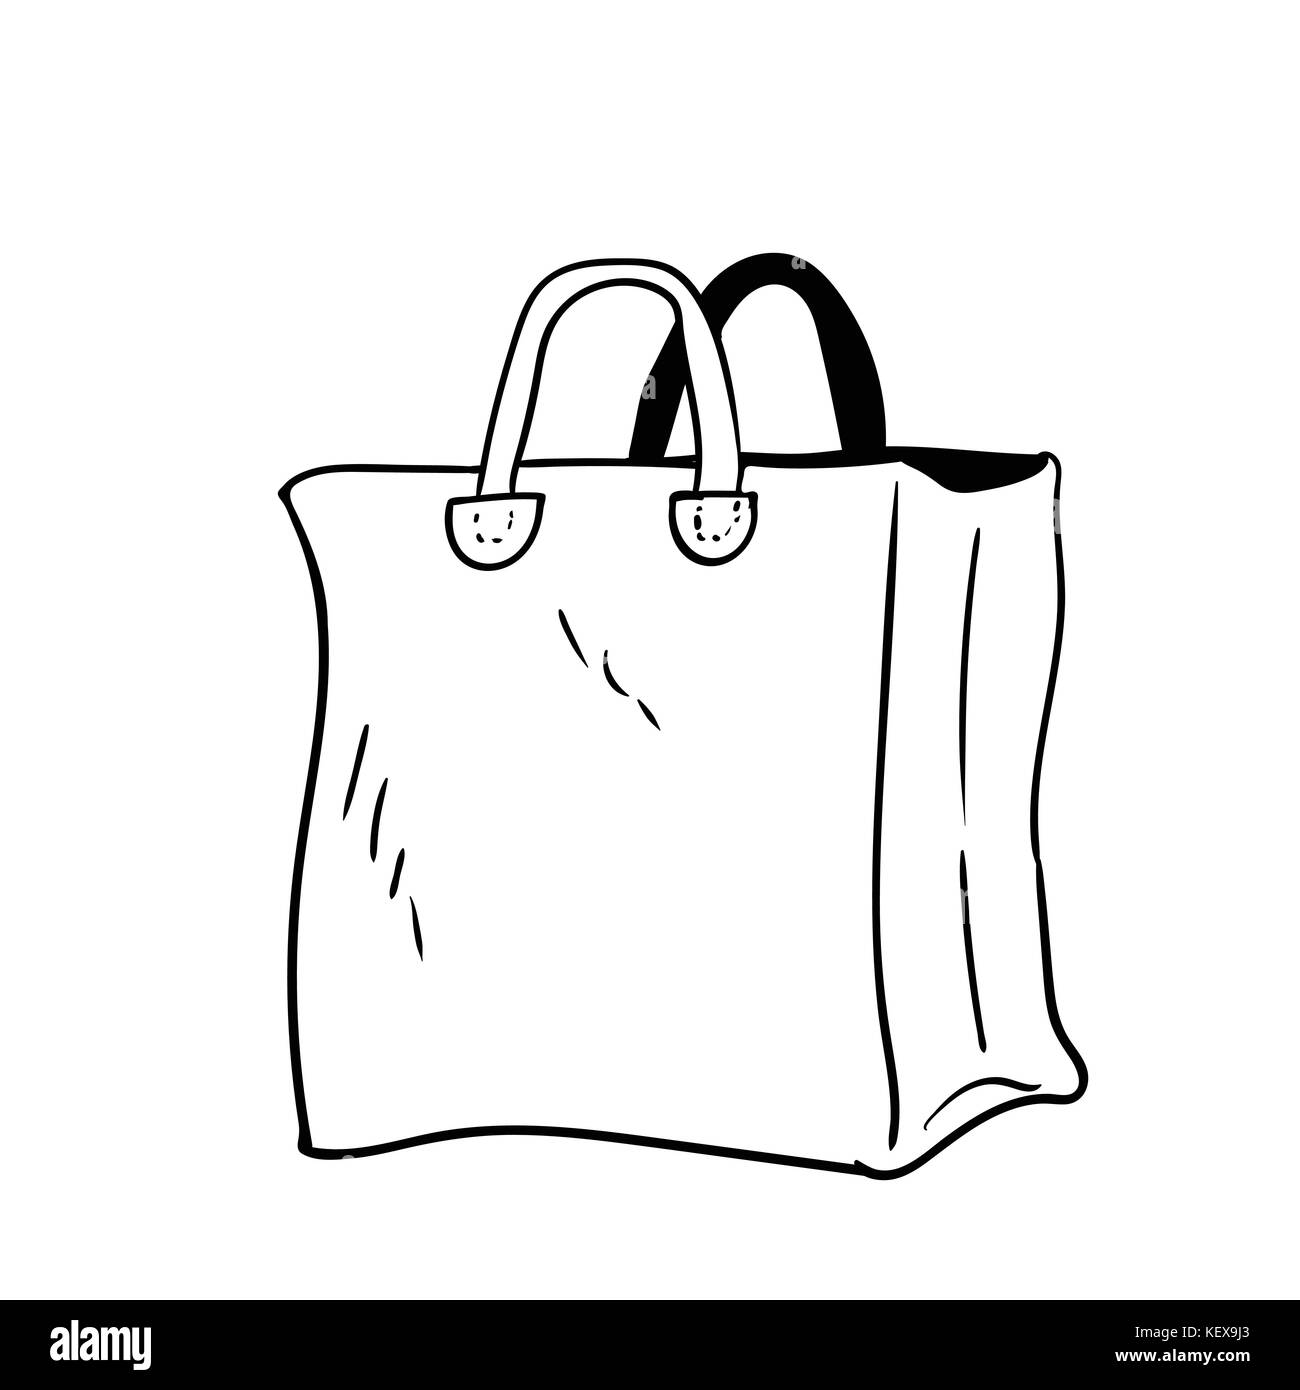 Illustration de la main sac style dessin anim des sacs - Dessin de la main ...